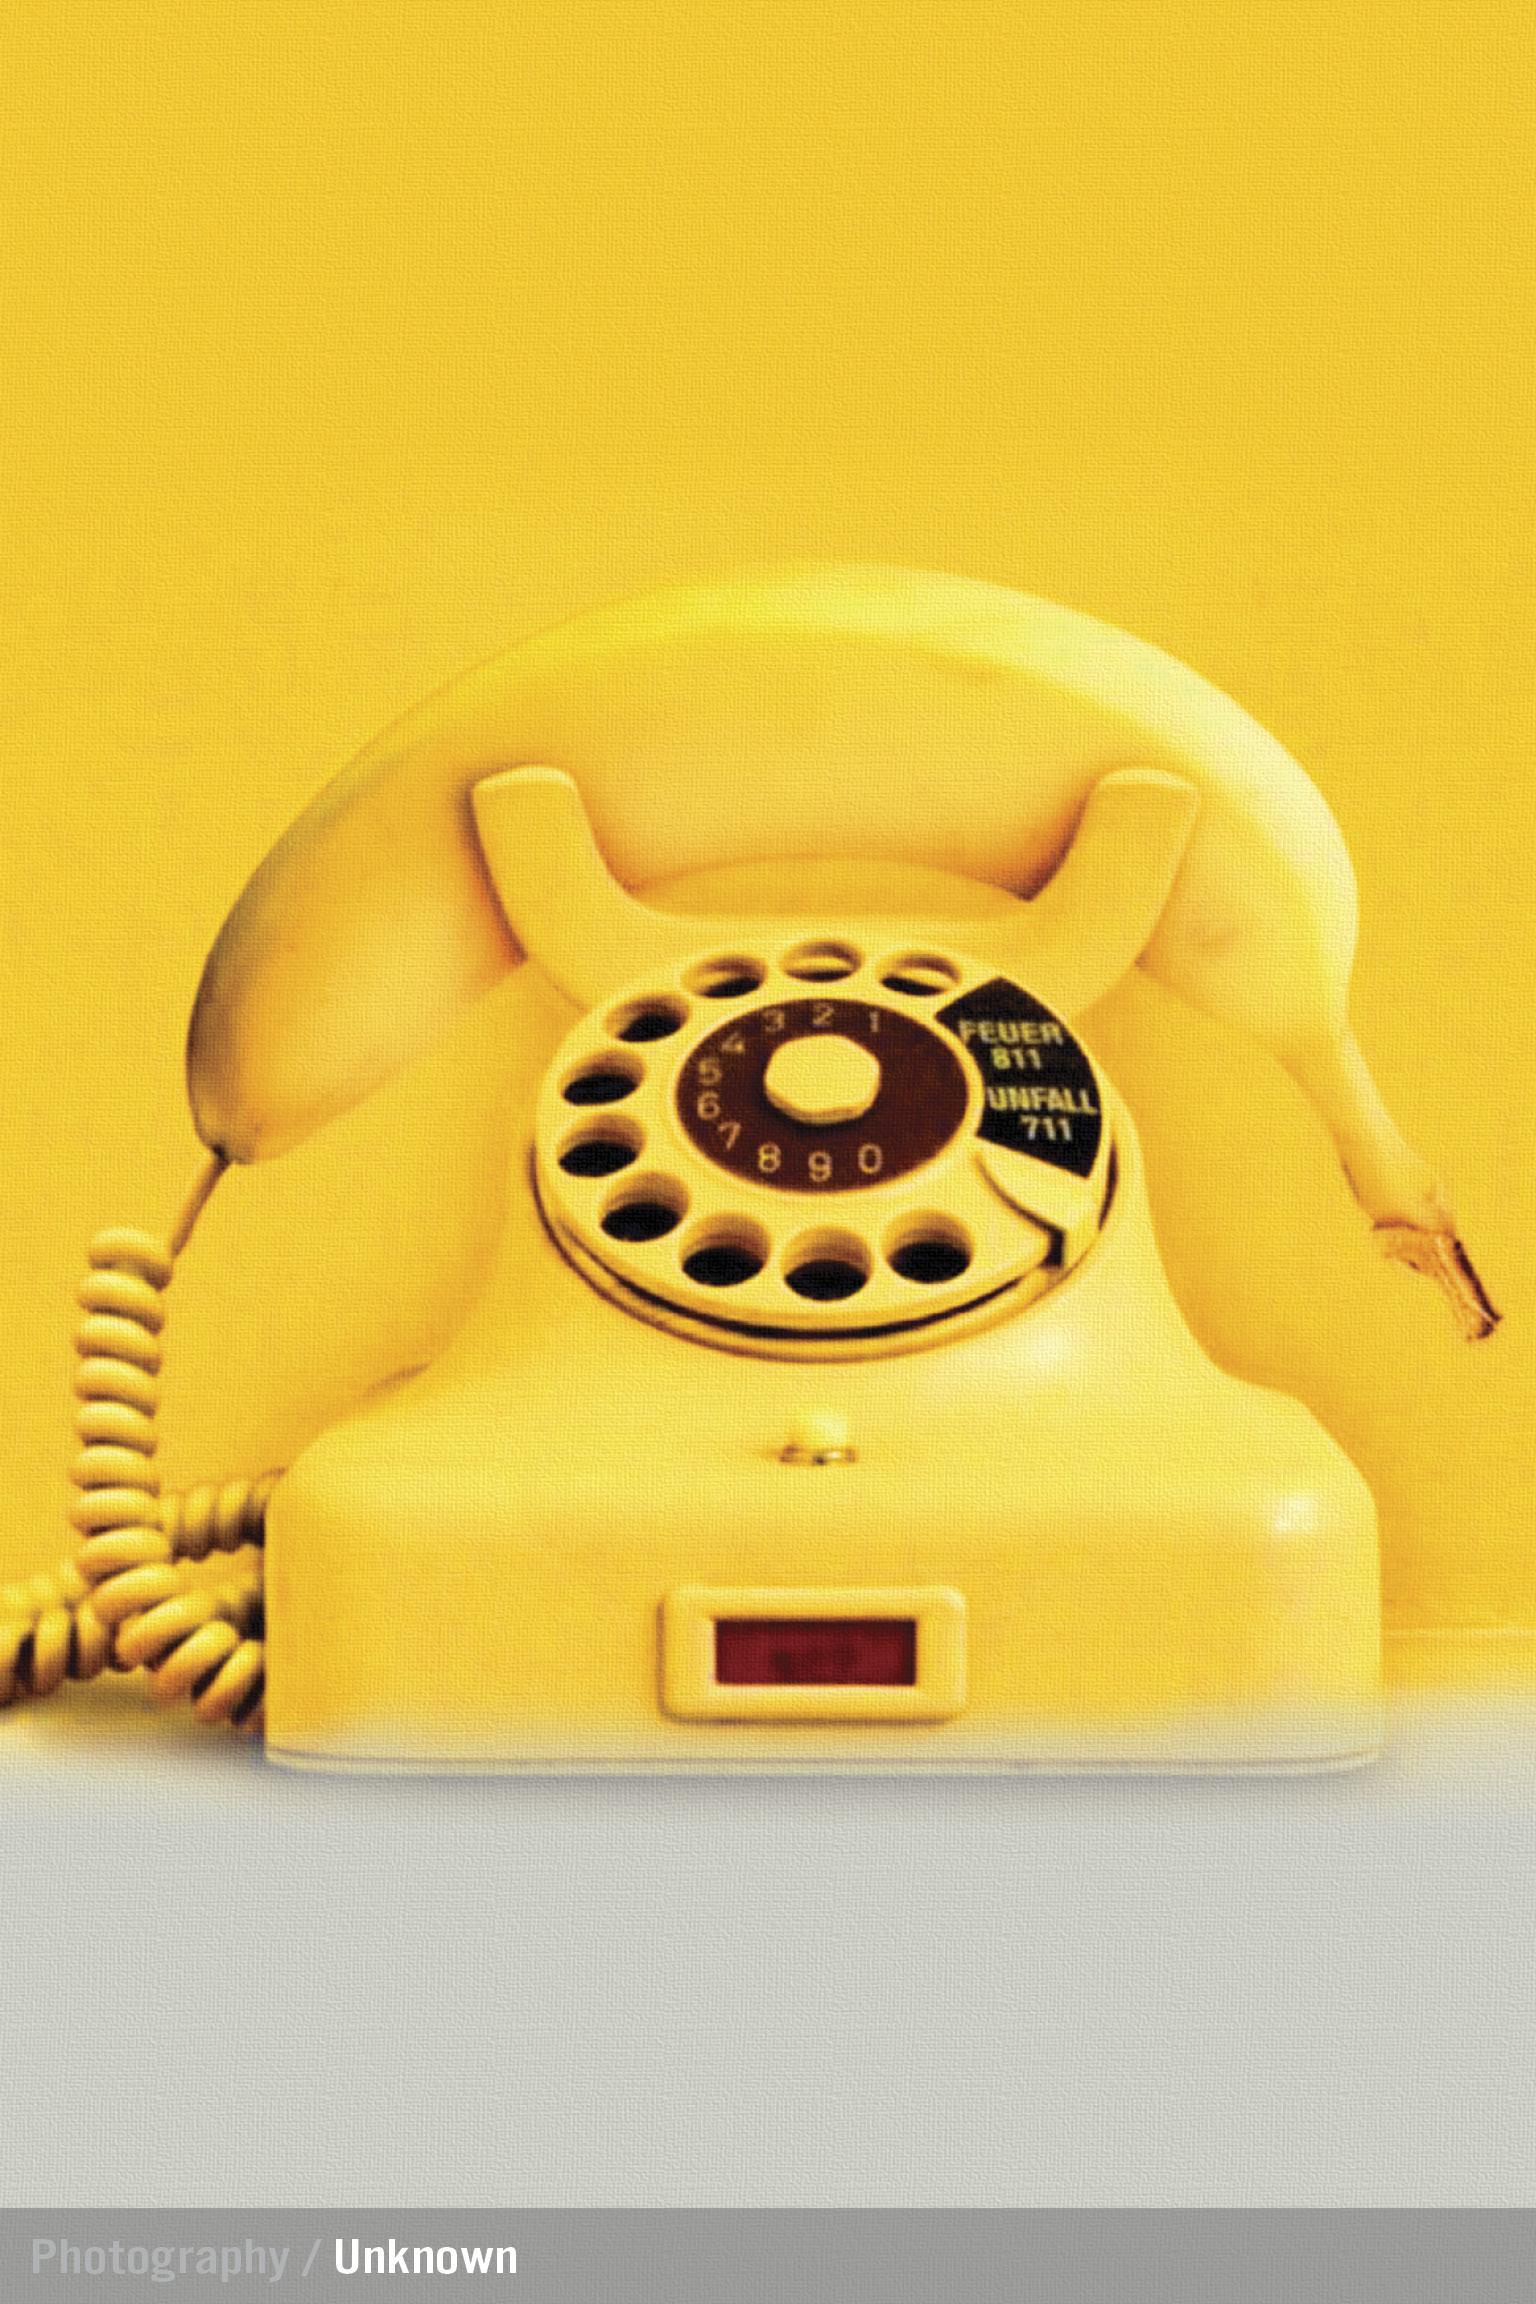 HOJNL003E4-BANANA-PHONE.jpg